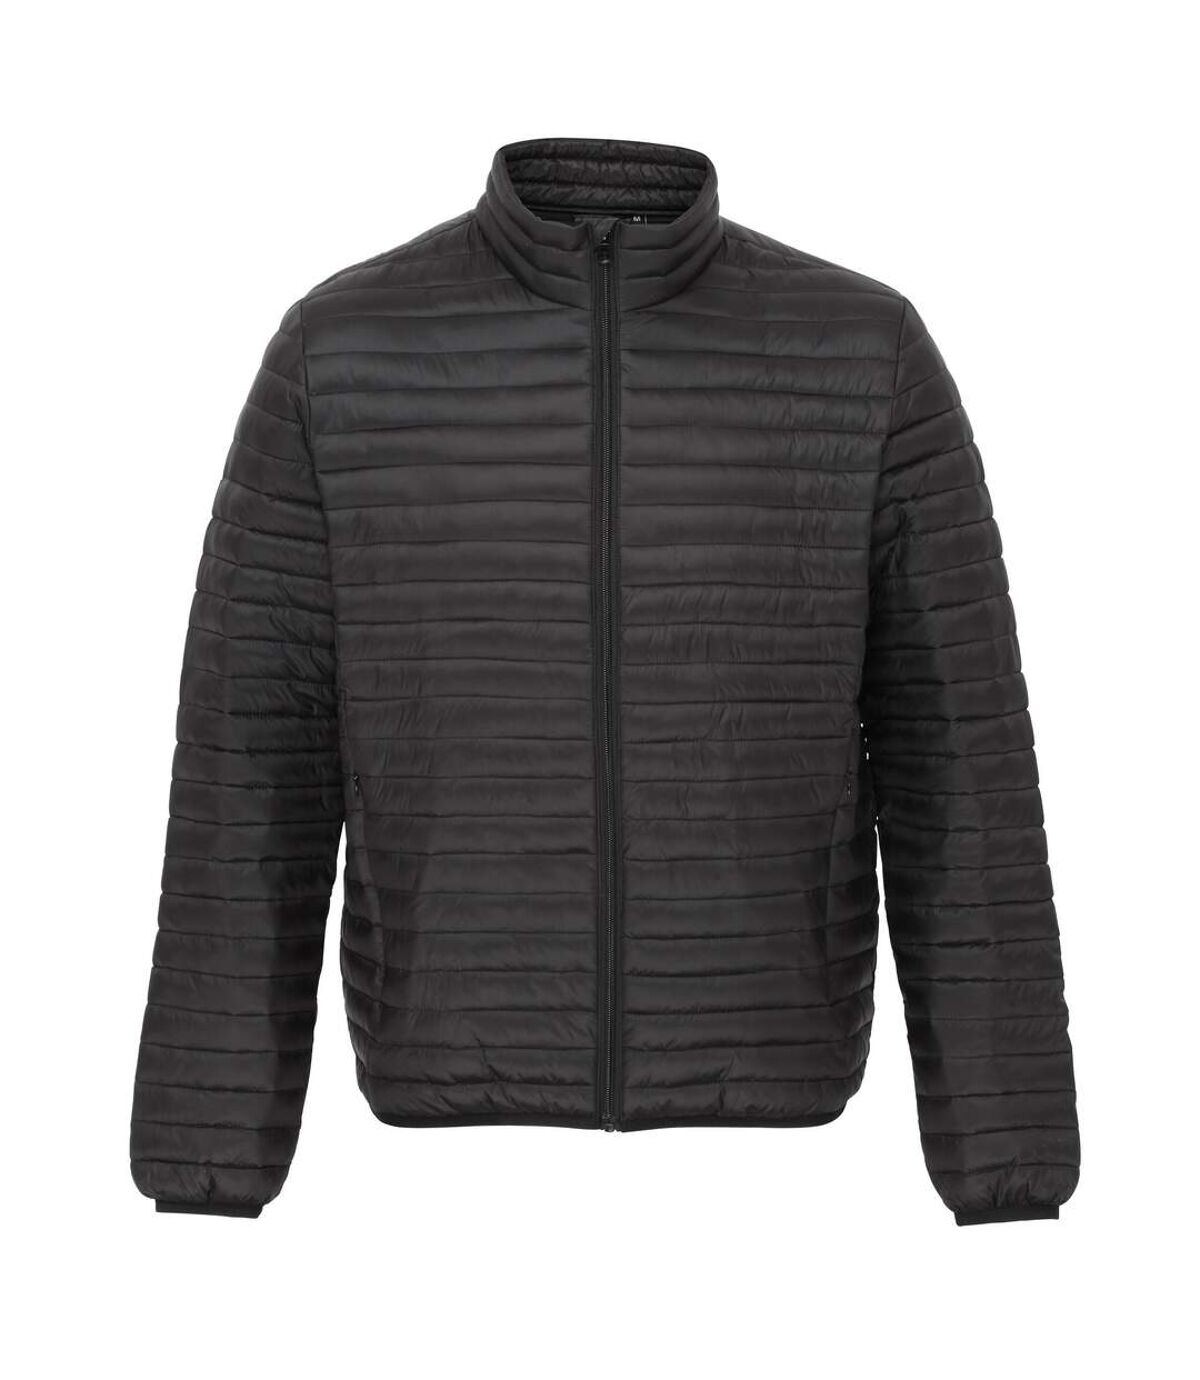 2786 Mens Tribe Fineline Padded Jacket (Black) - UTRW3846